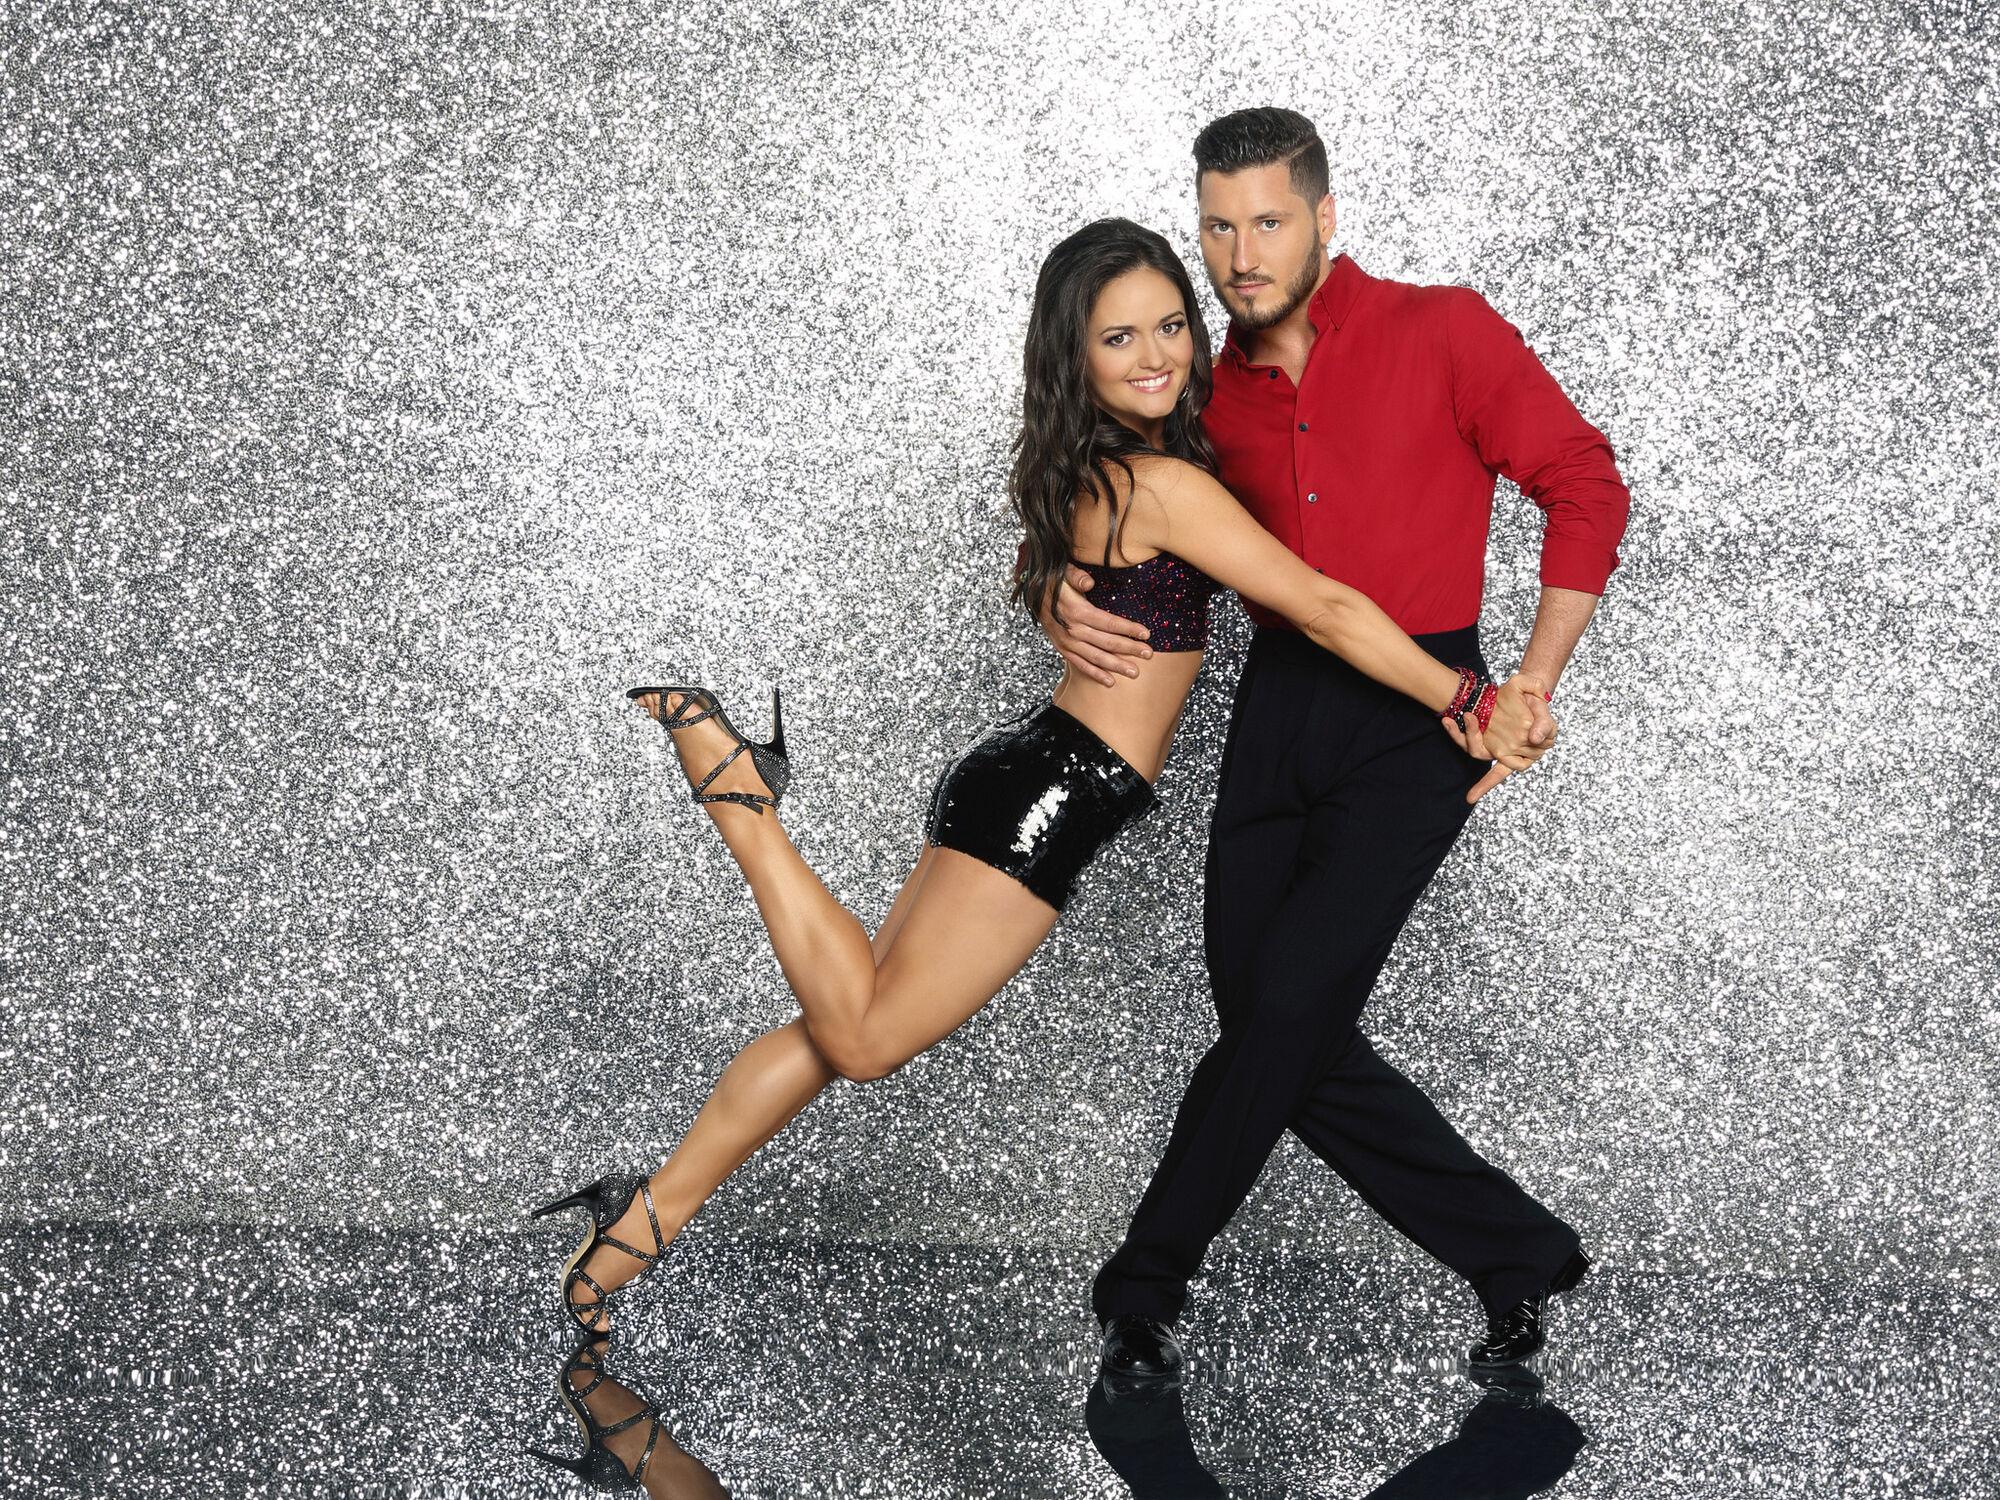 Danica McKellar | Dancing with the Stars Wiki | FANDOM